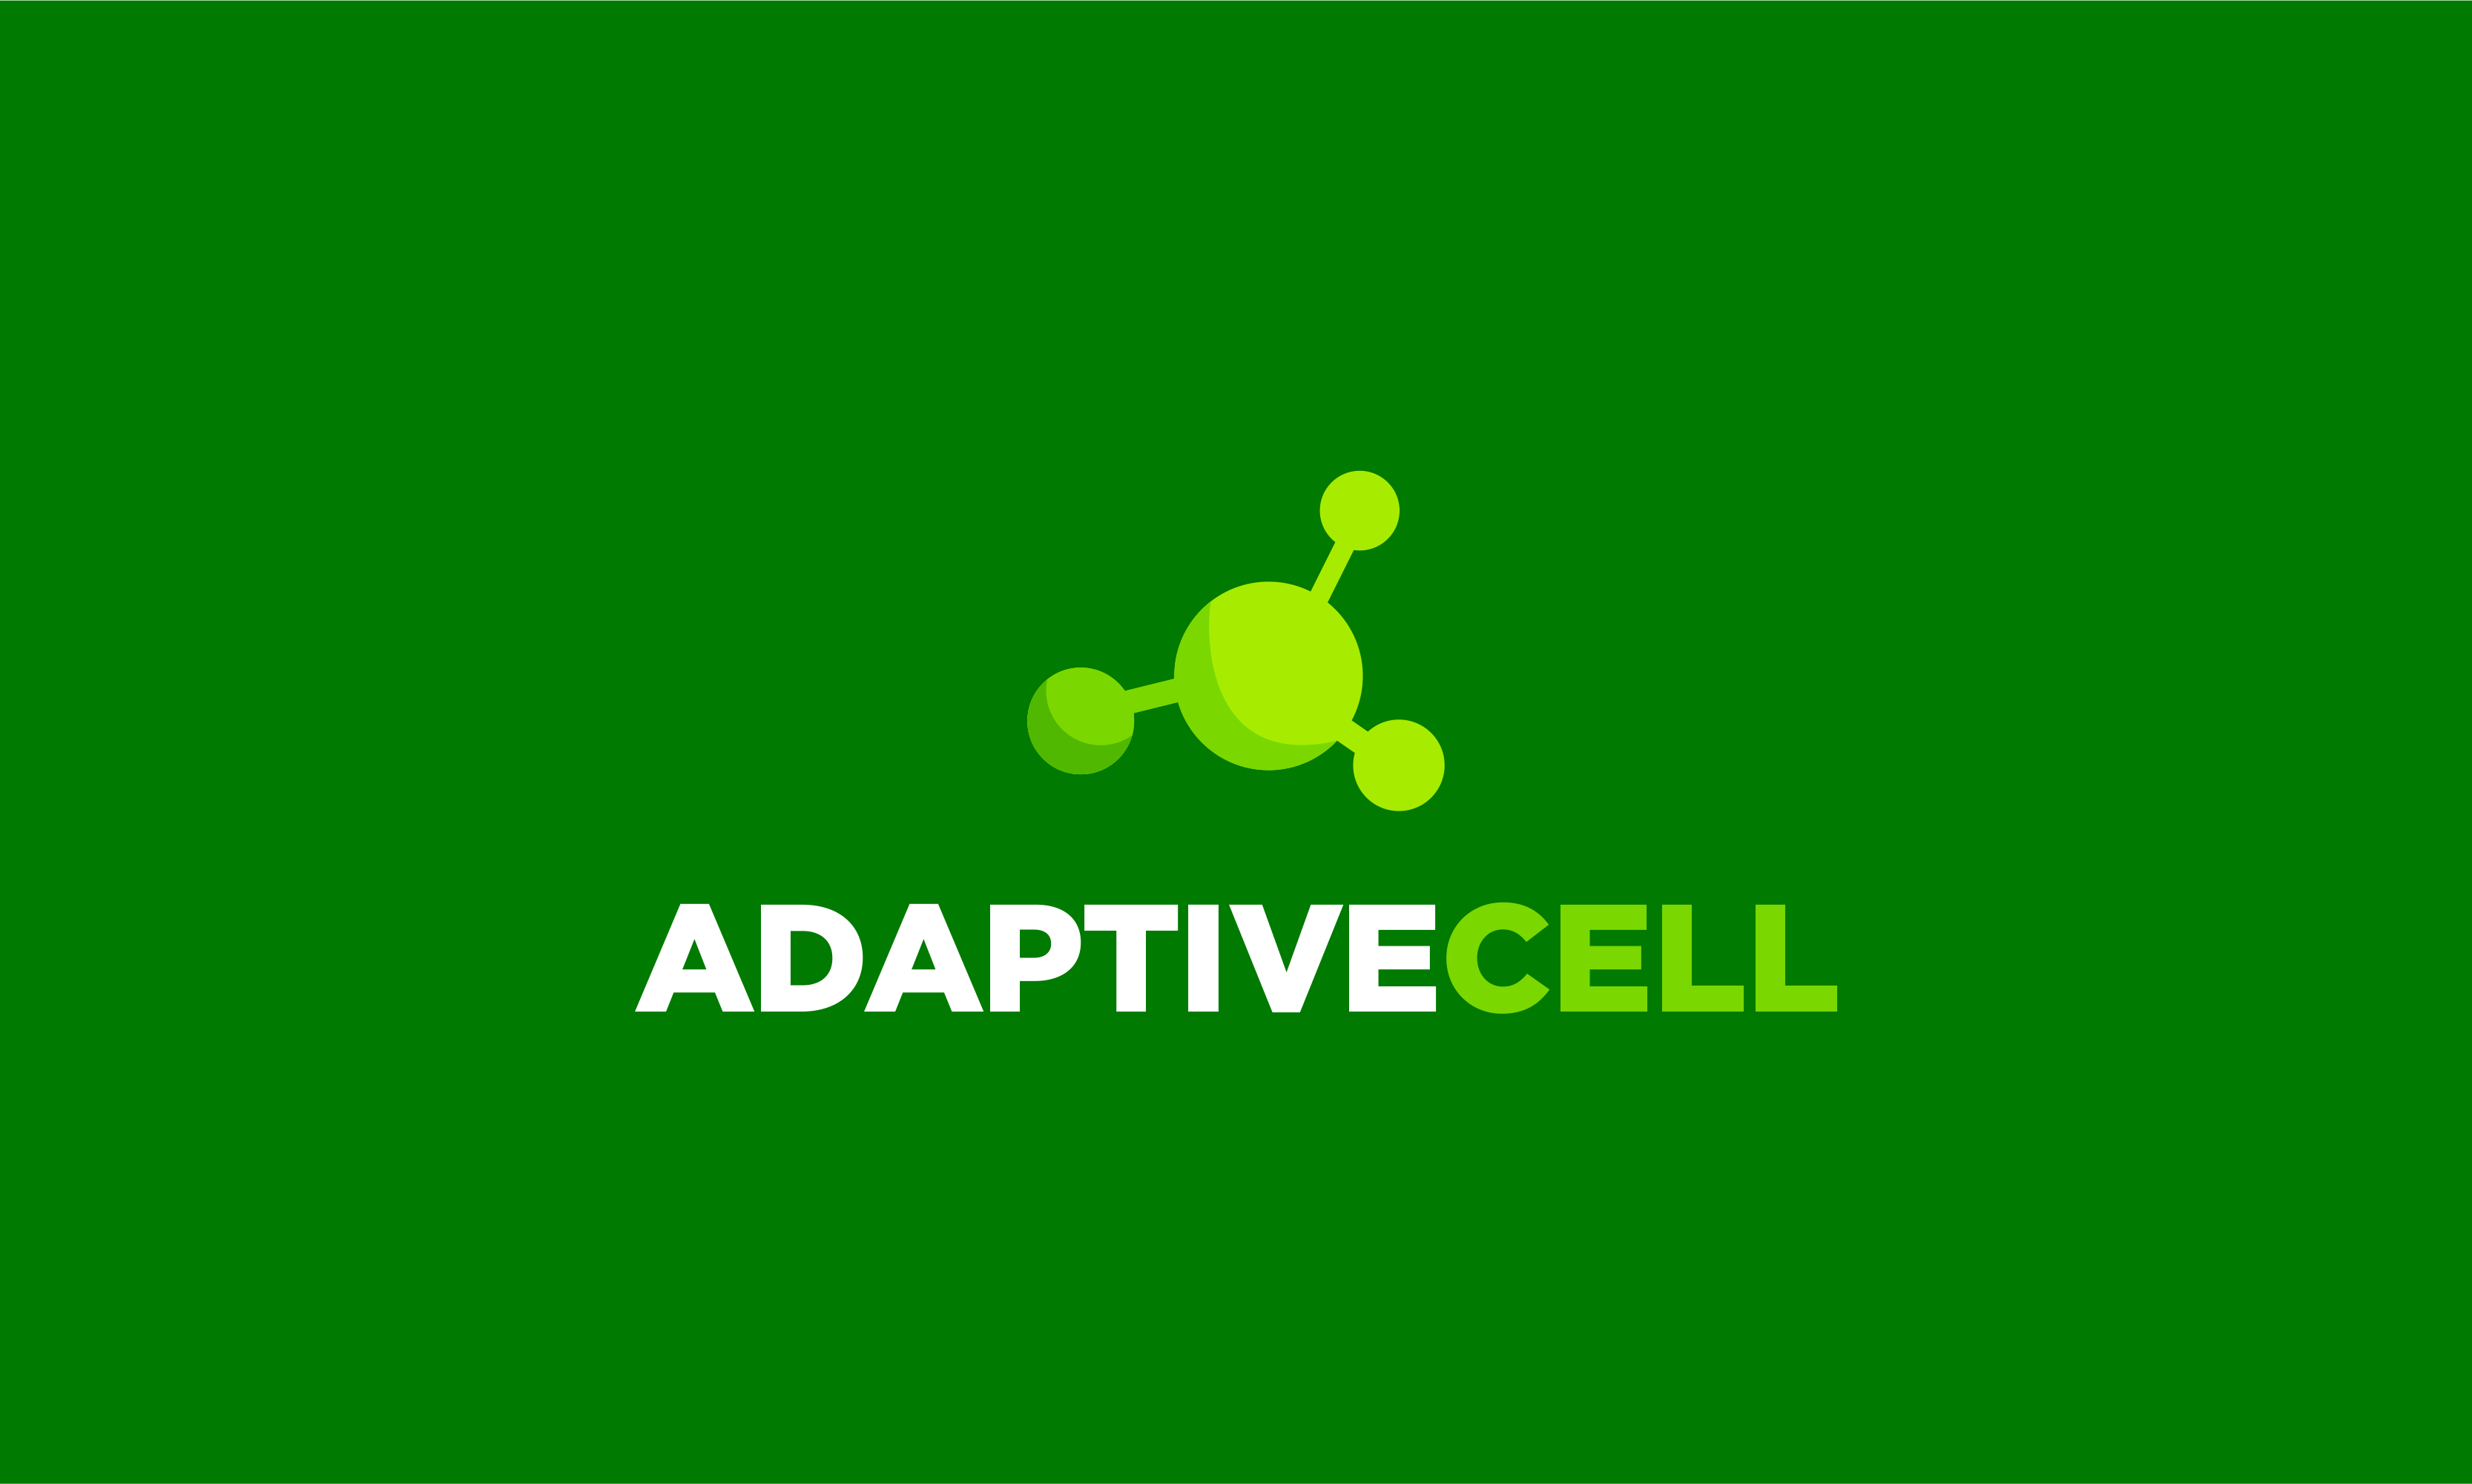 Adaptivecell